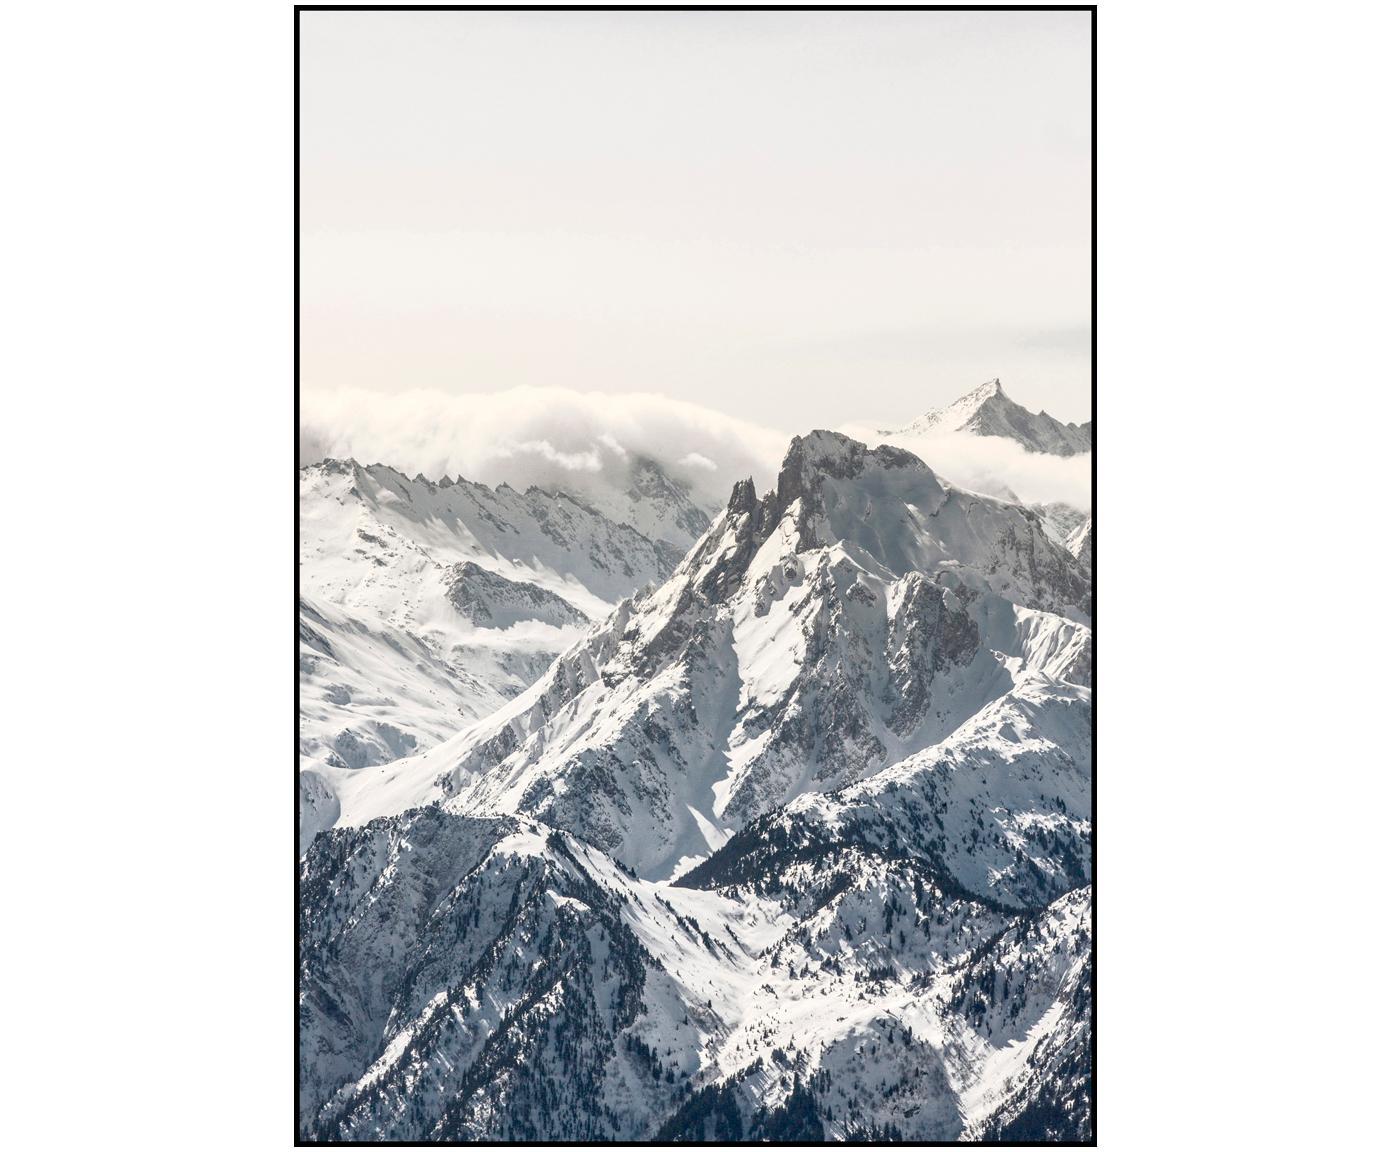 Ingelijste digitale print White Mountain, Afbeelding: digitale druk op papier (, Lijst: gelakt HDF, Zwart, wit, grijs, 70 x 100 cm